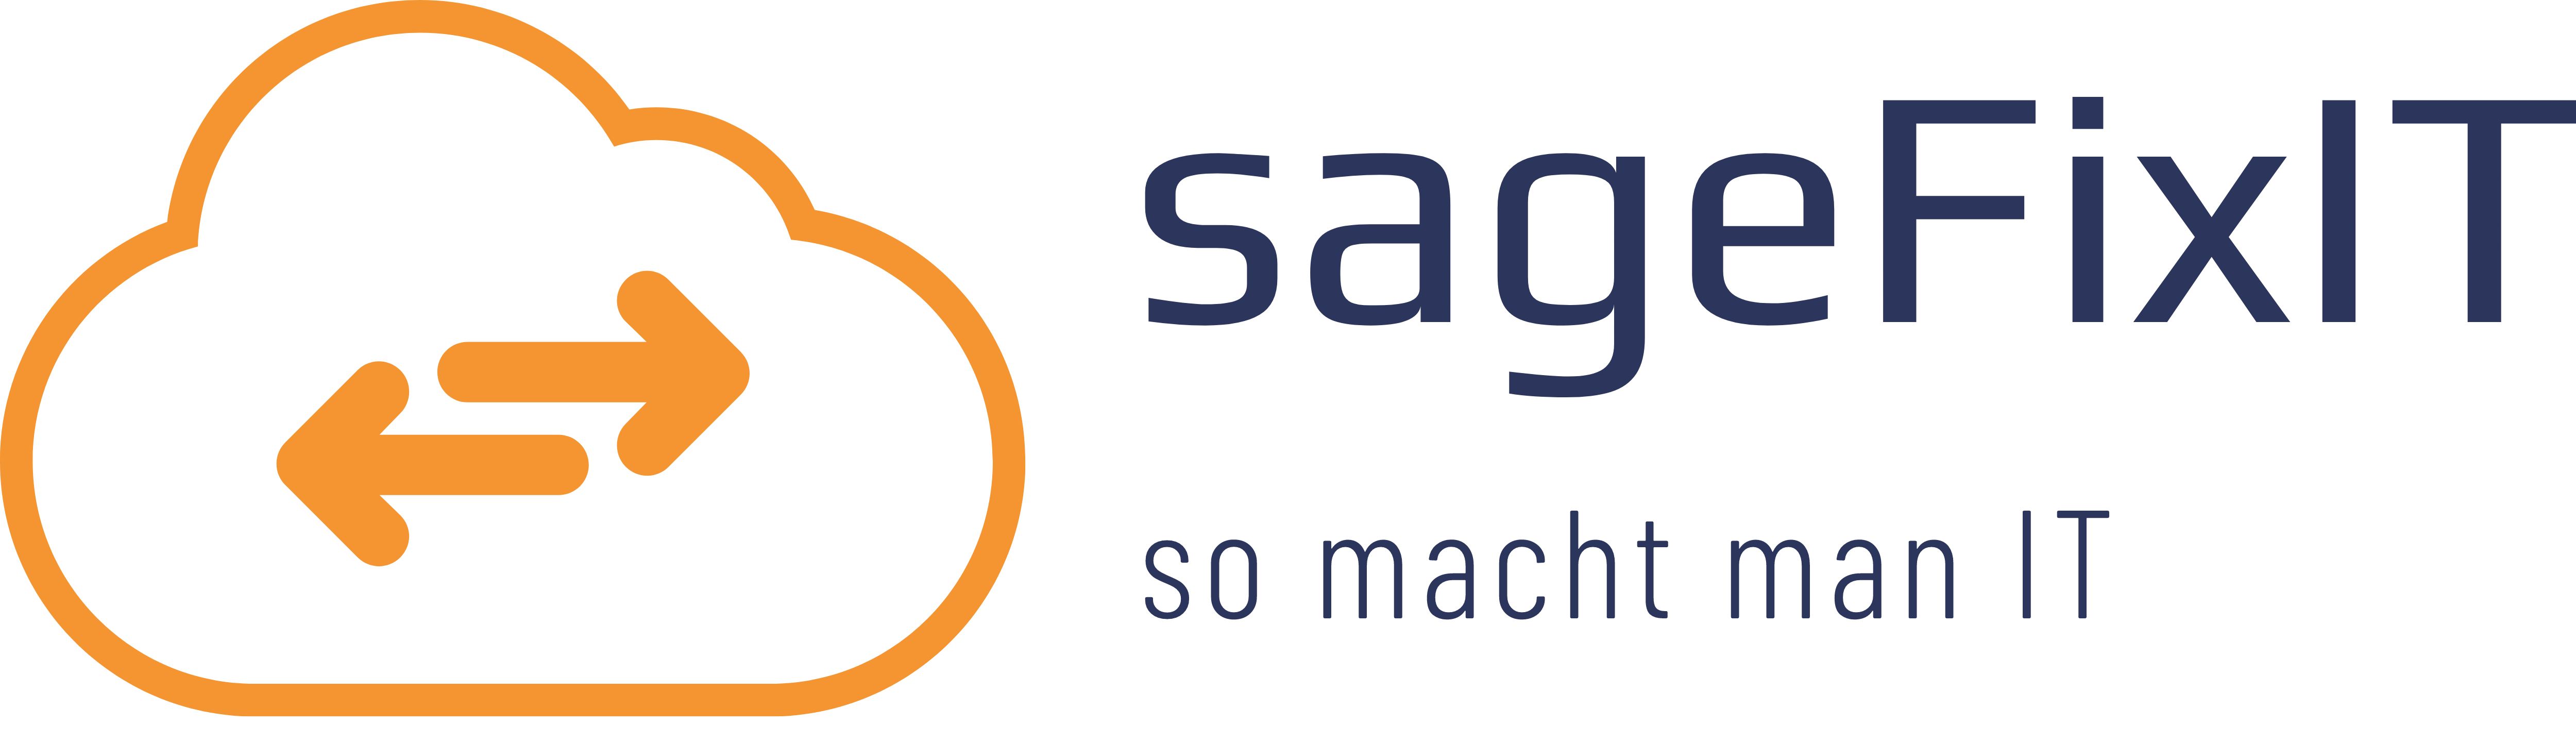 Alexander Sagmeister